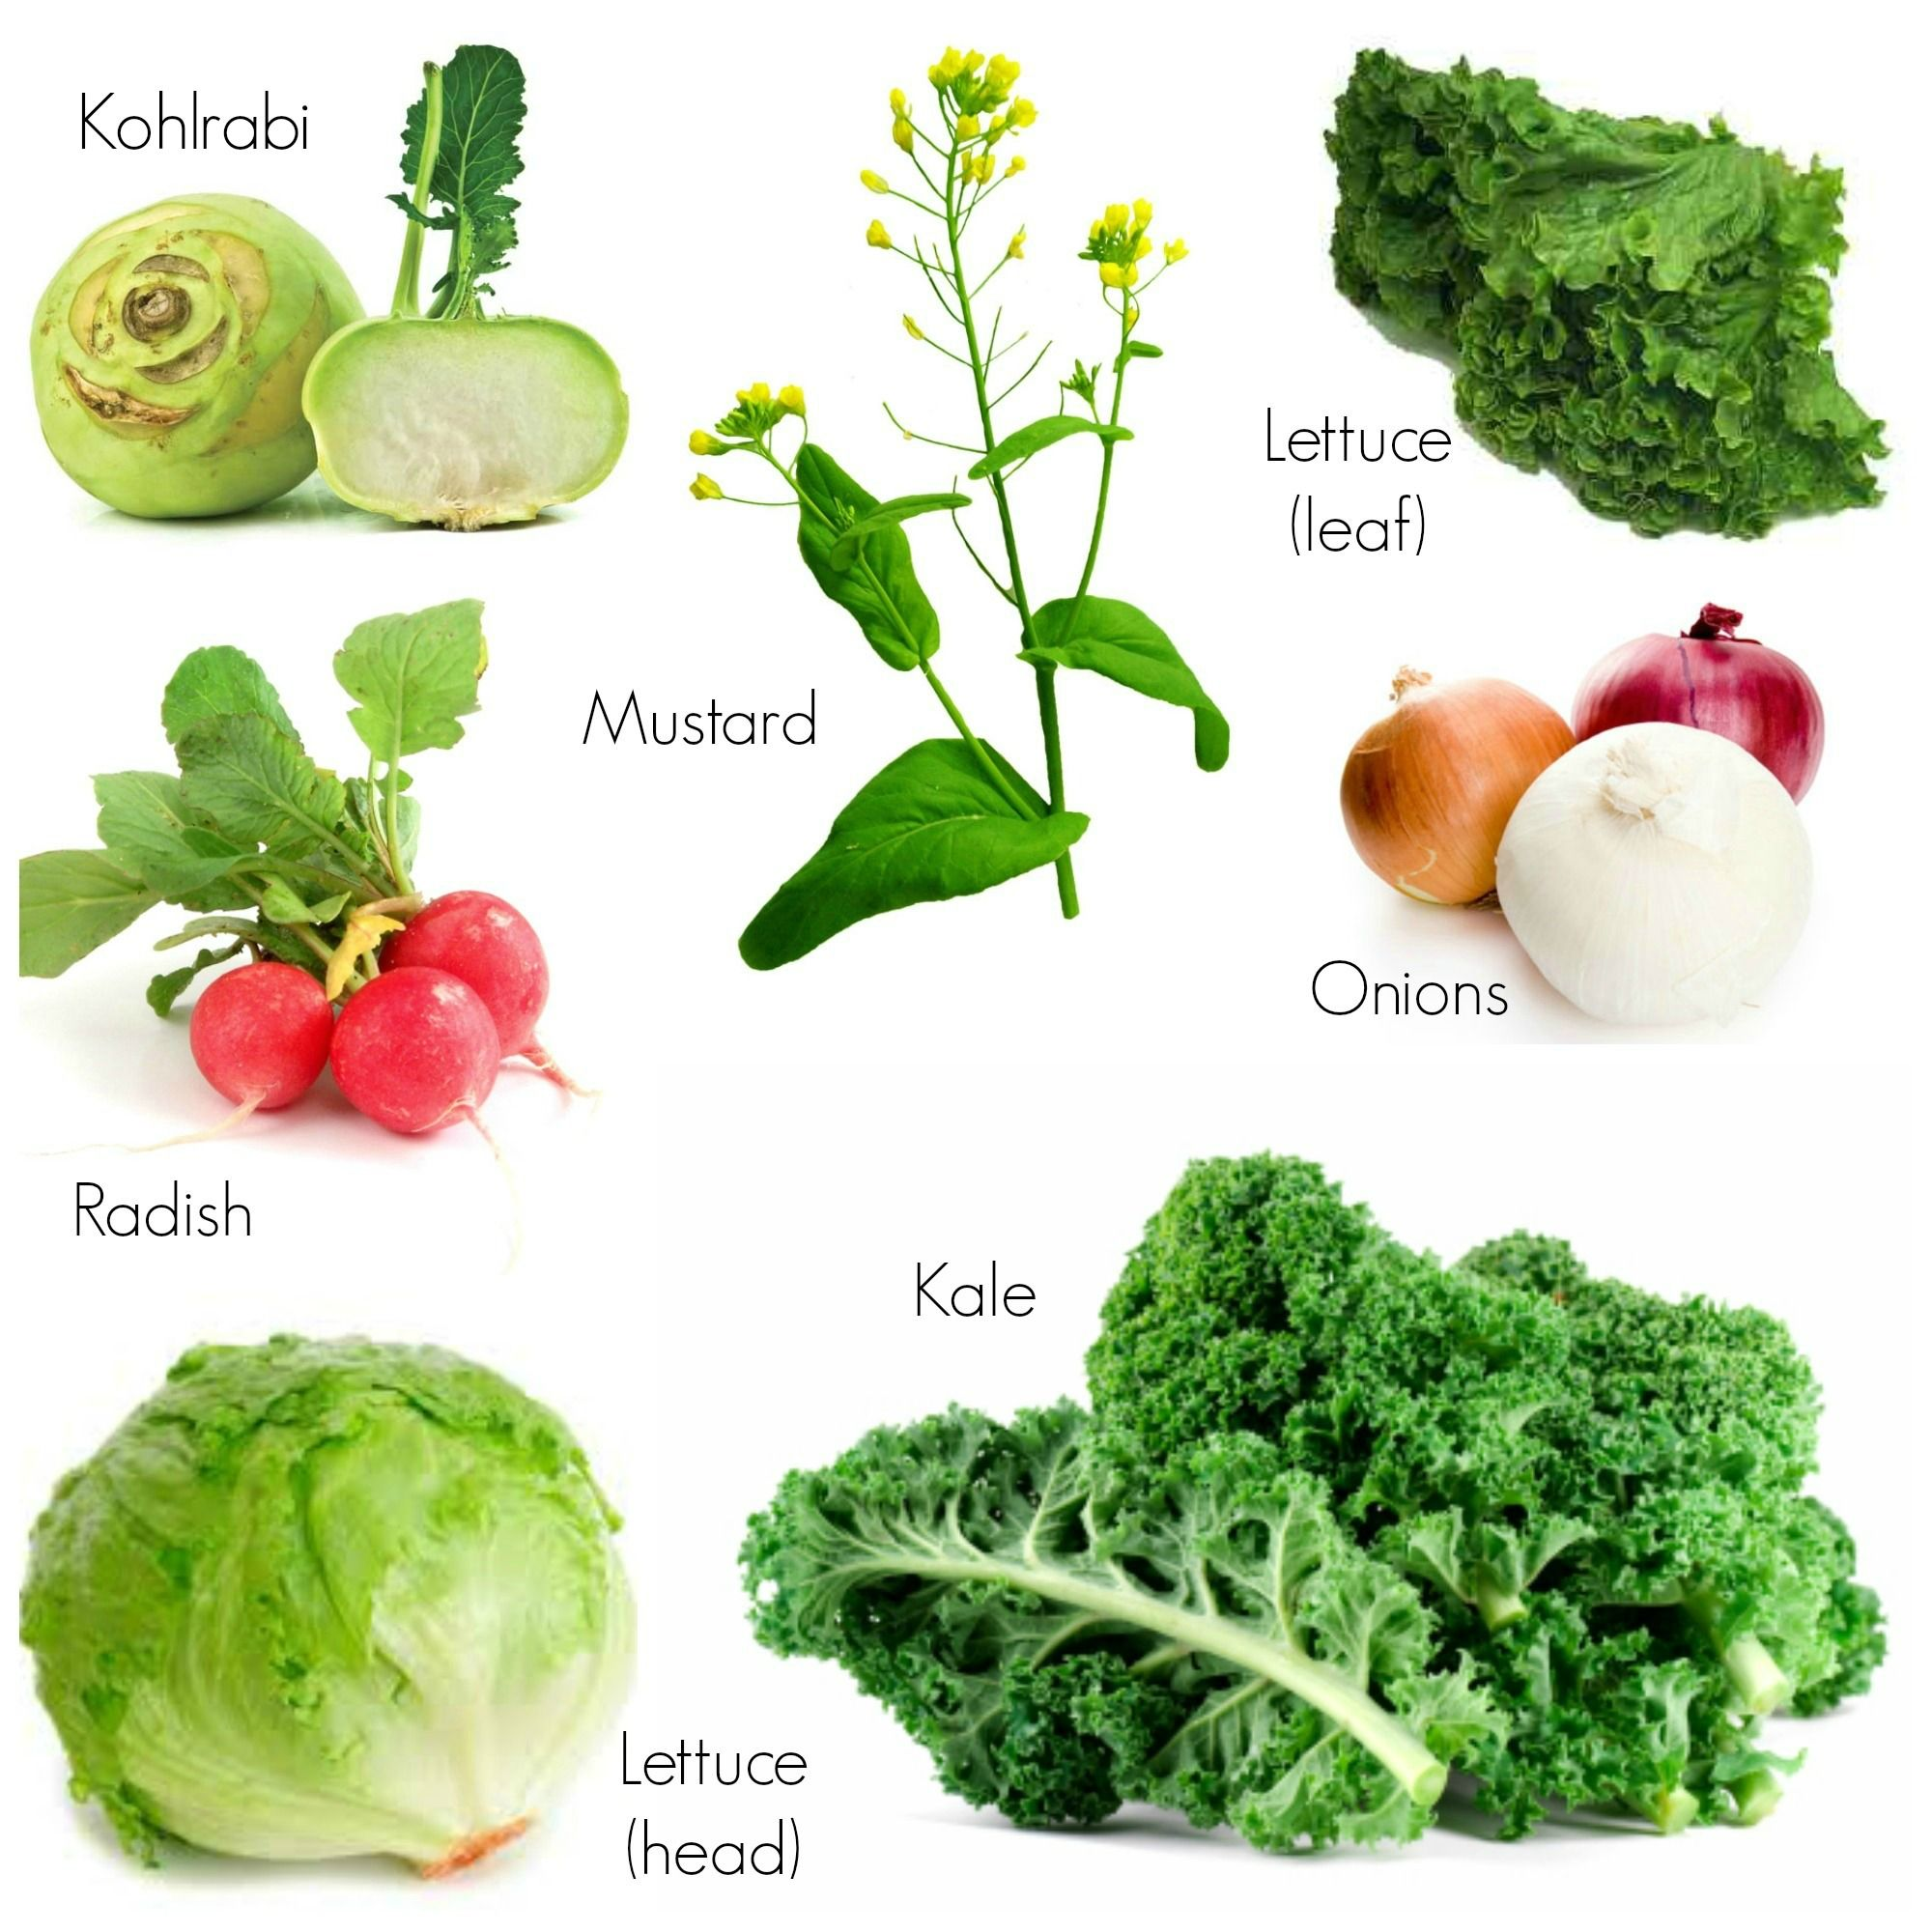 How To Grow And Use Fall Veggies